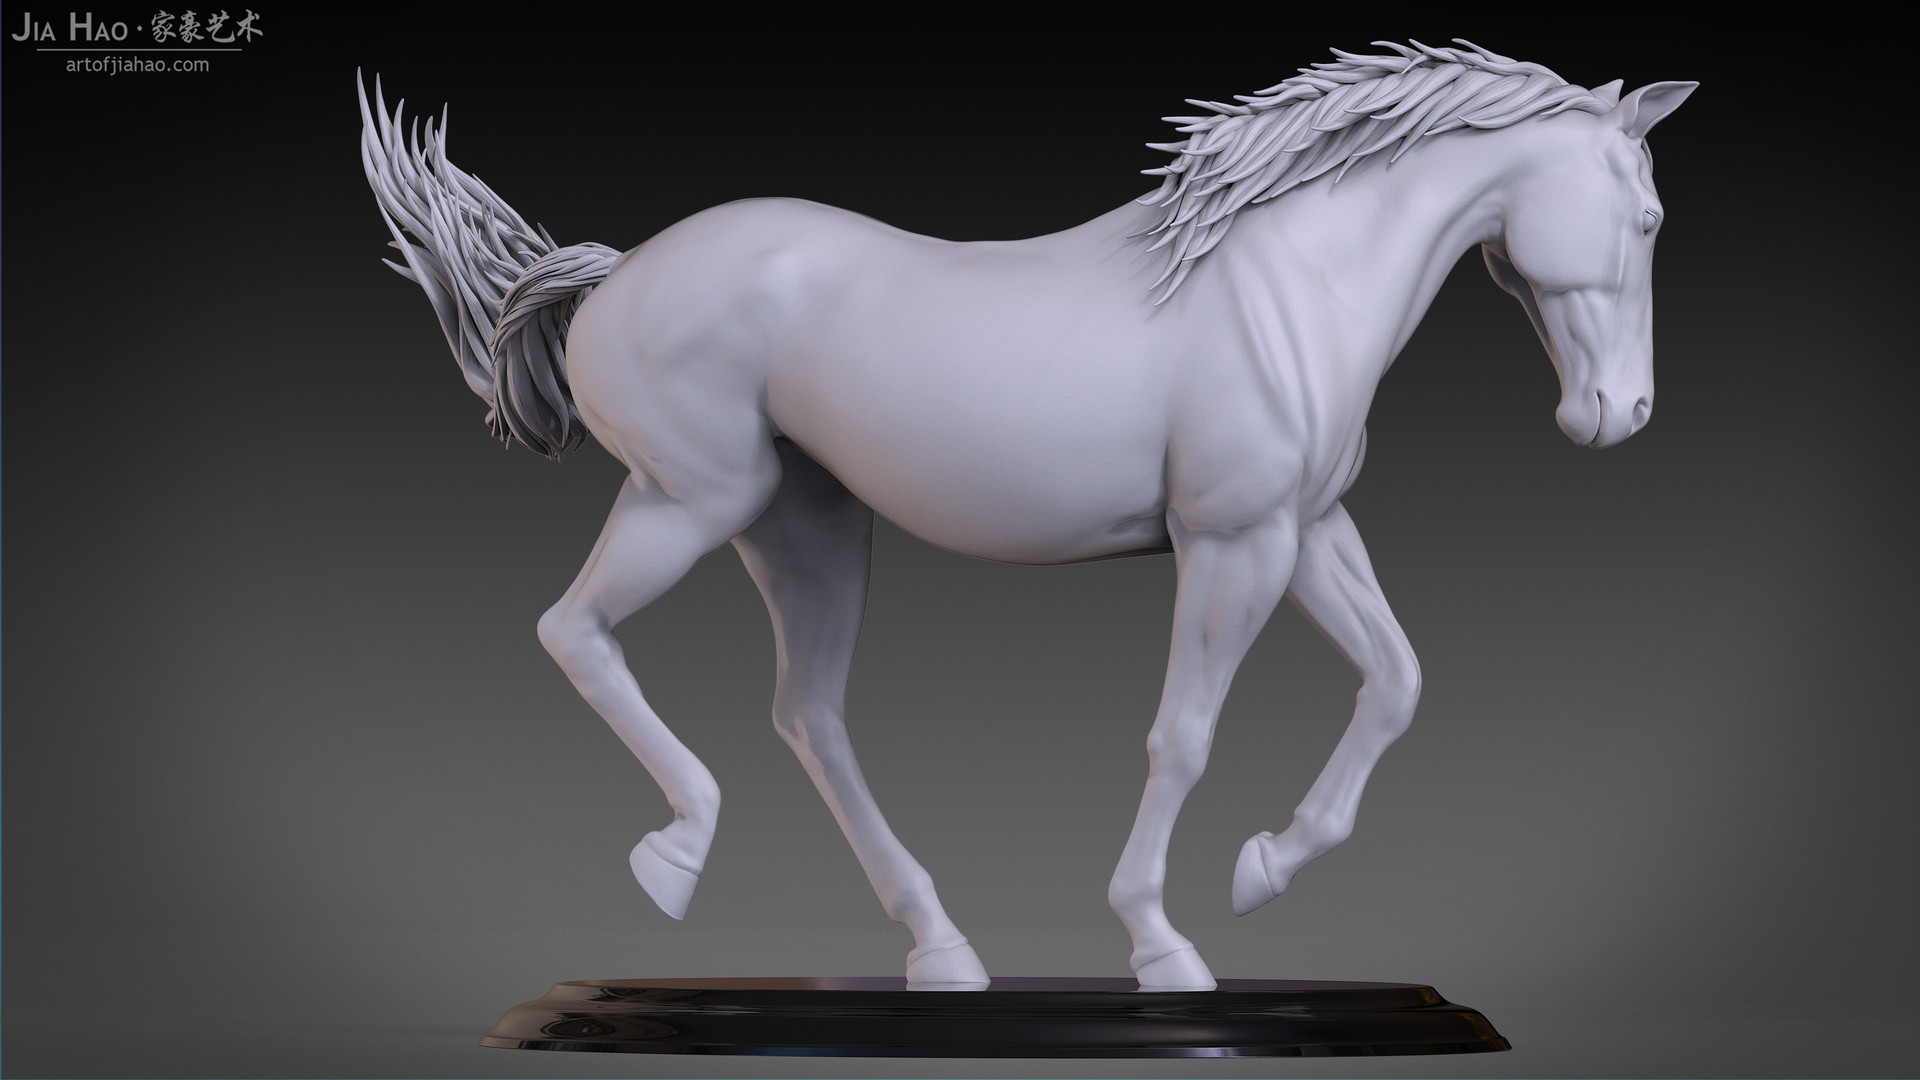 Jia hao horse sculpture comp clay 06